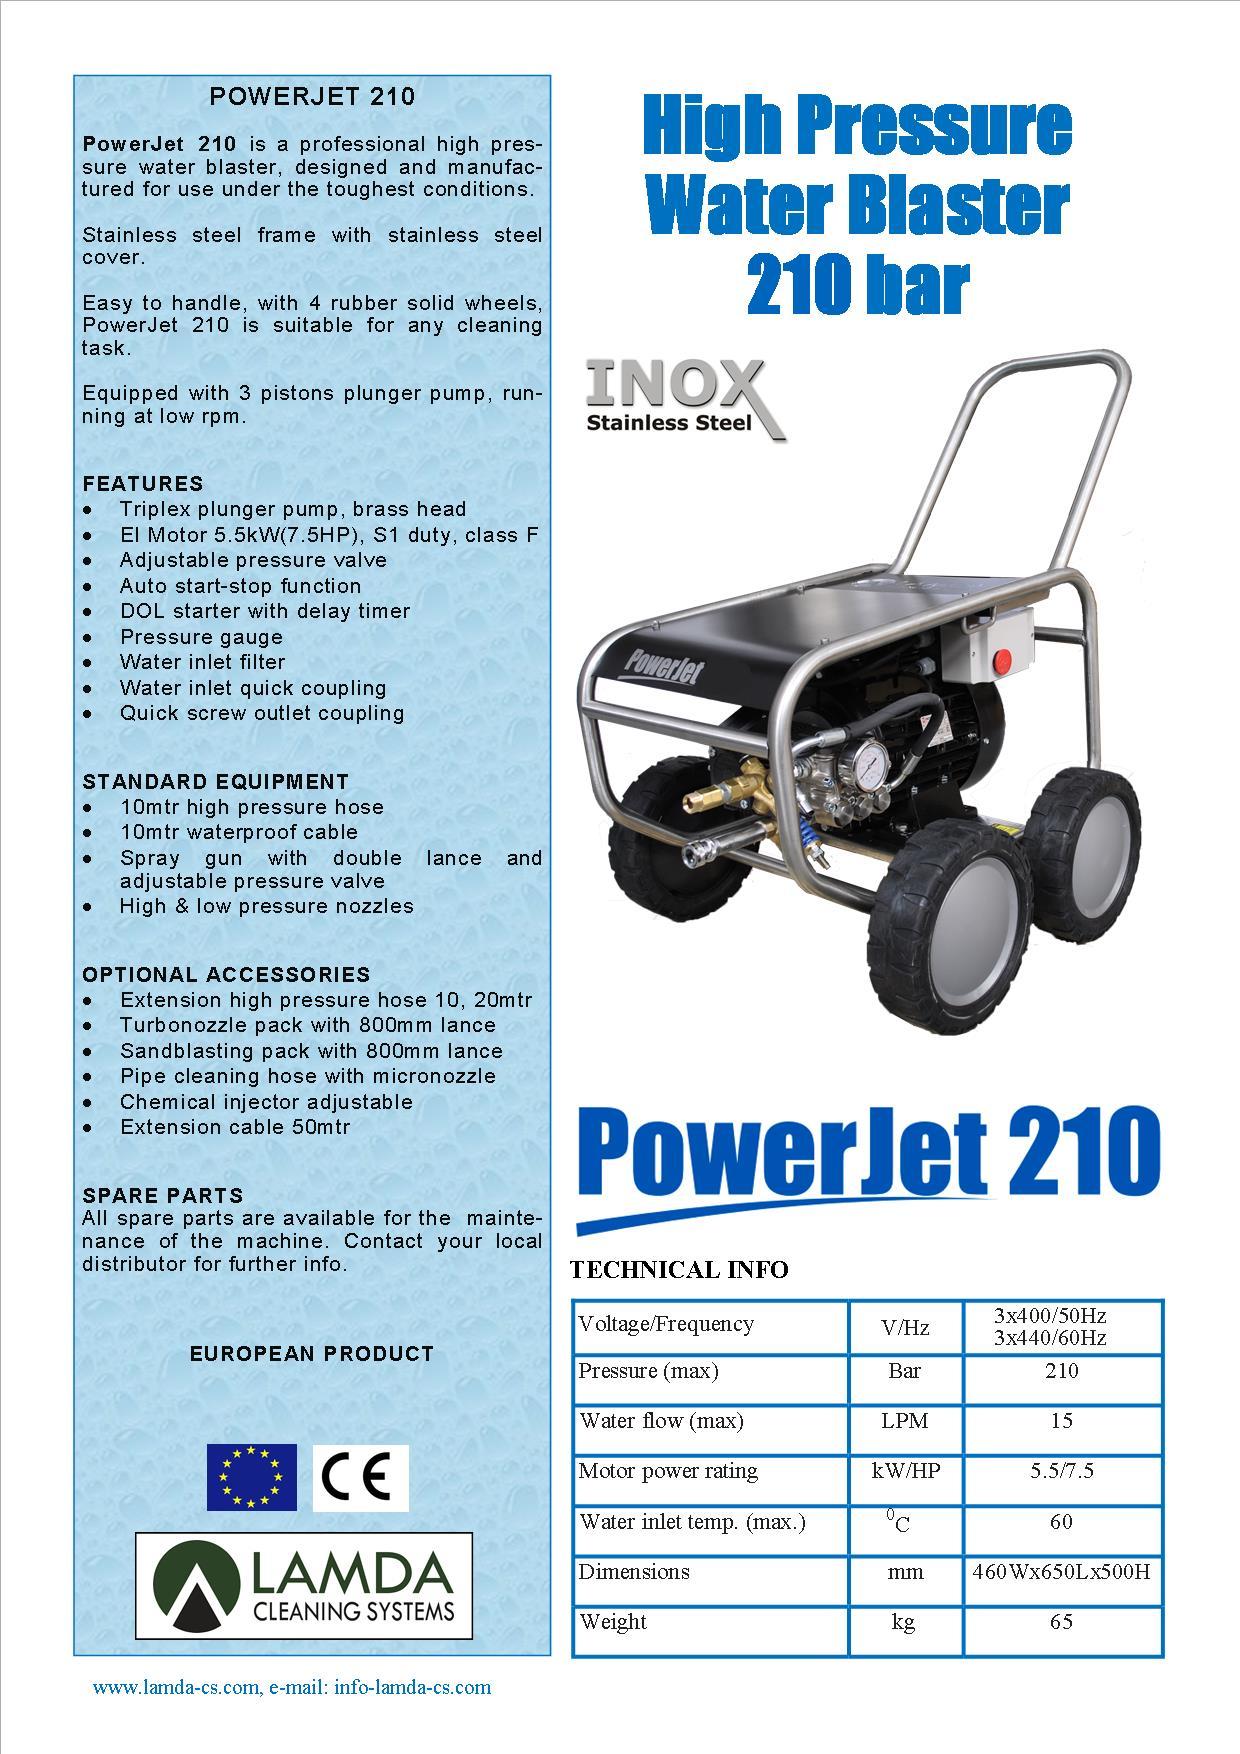 Powerjet 210e 3x440v 60hz Inox